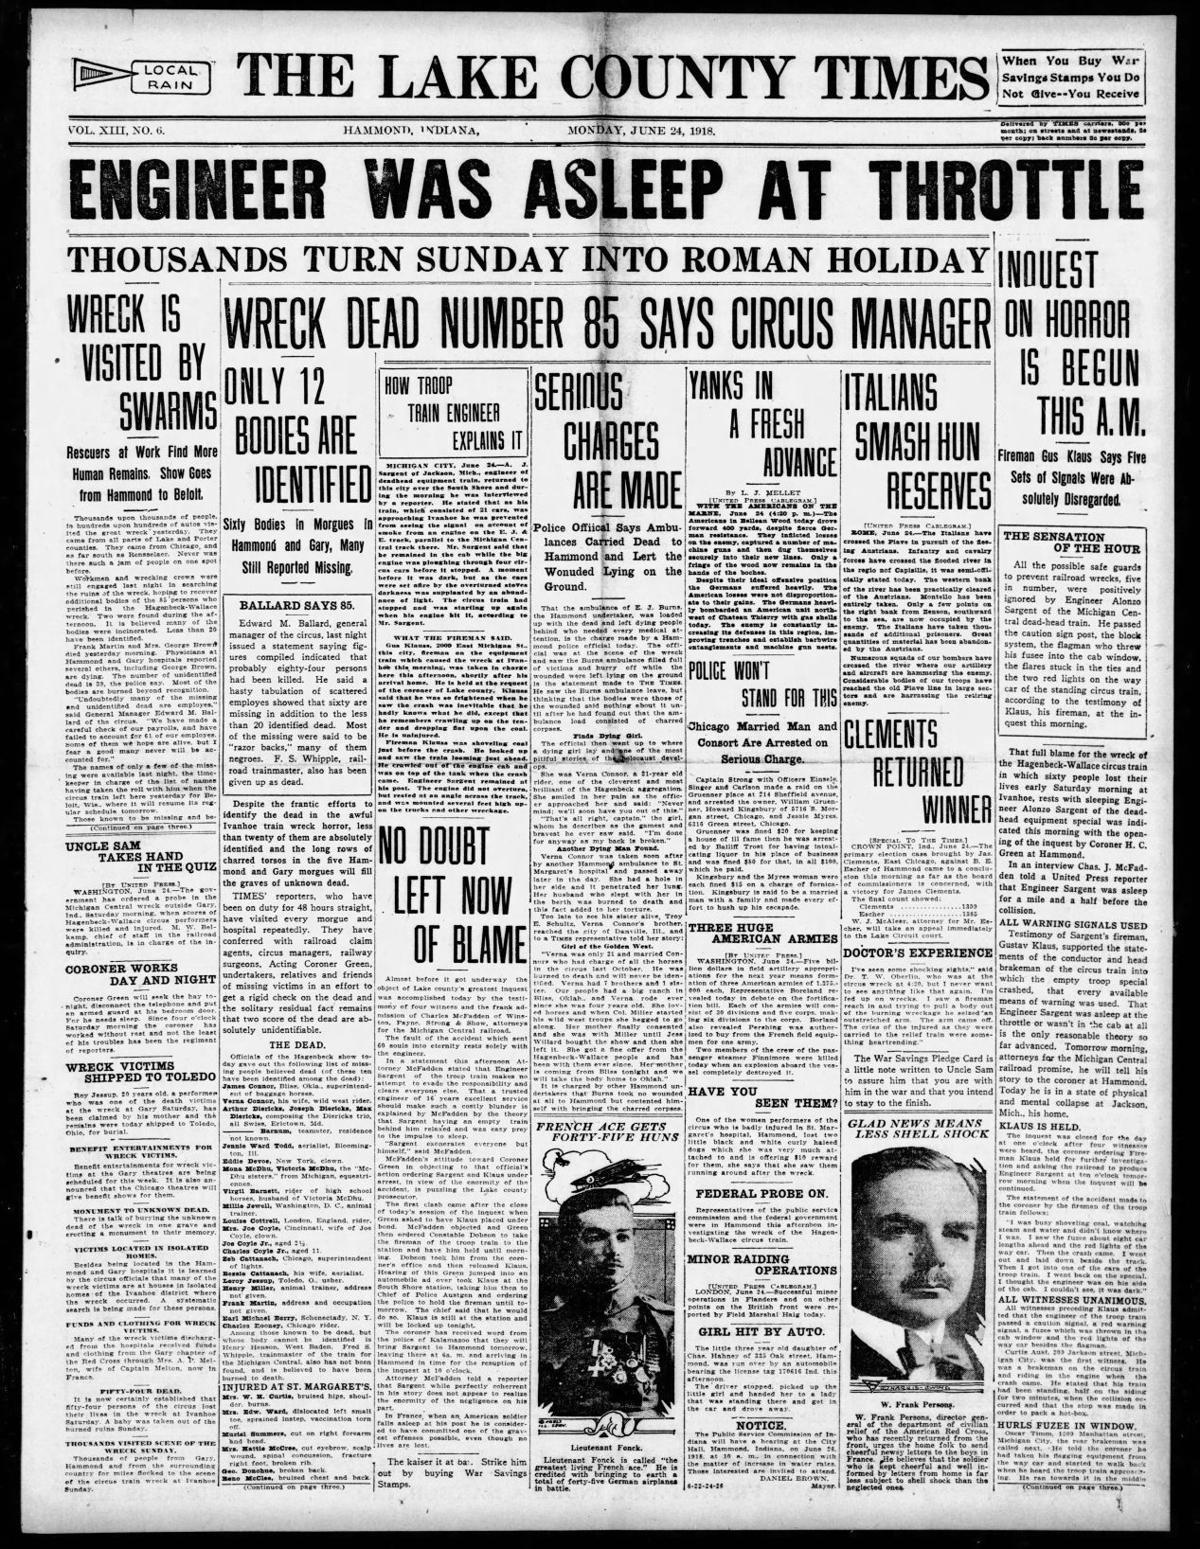 June 24, 1918: Engineer Was Asleep At Throttle